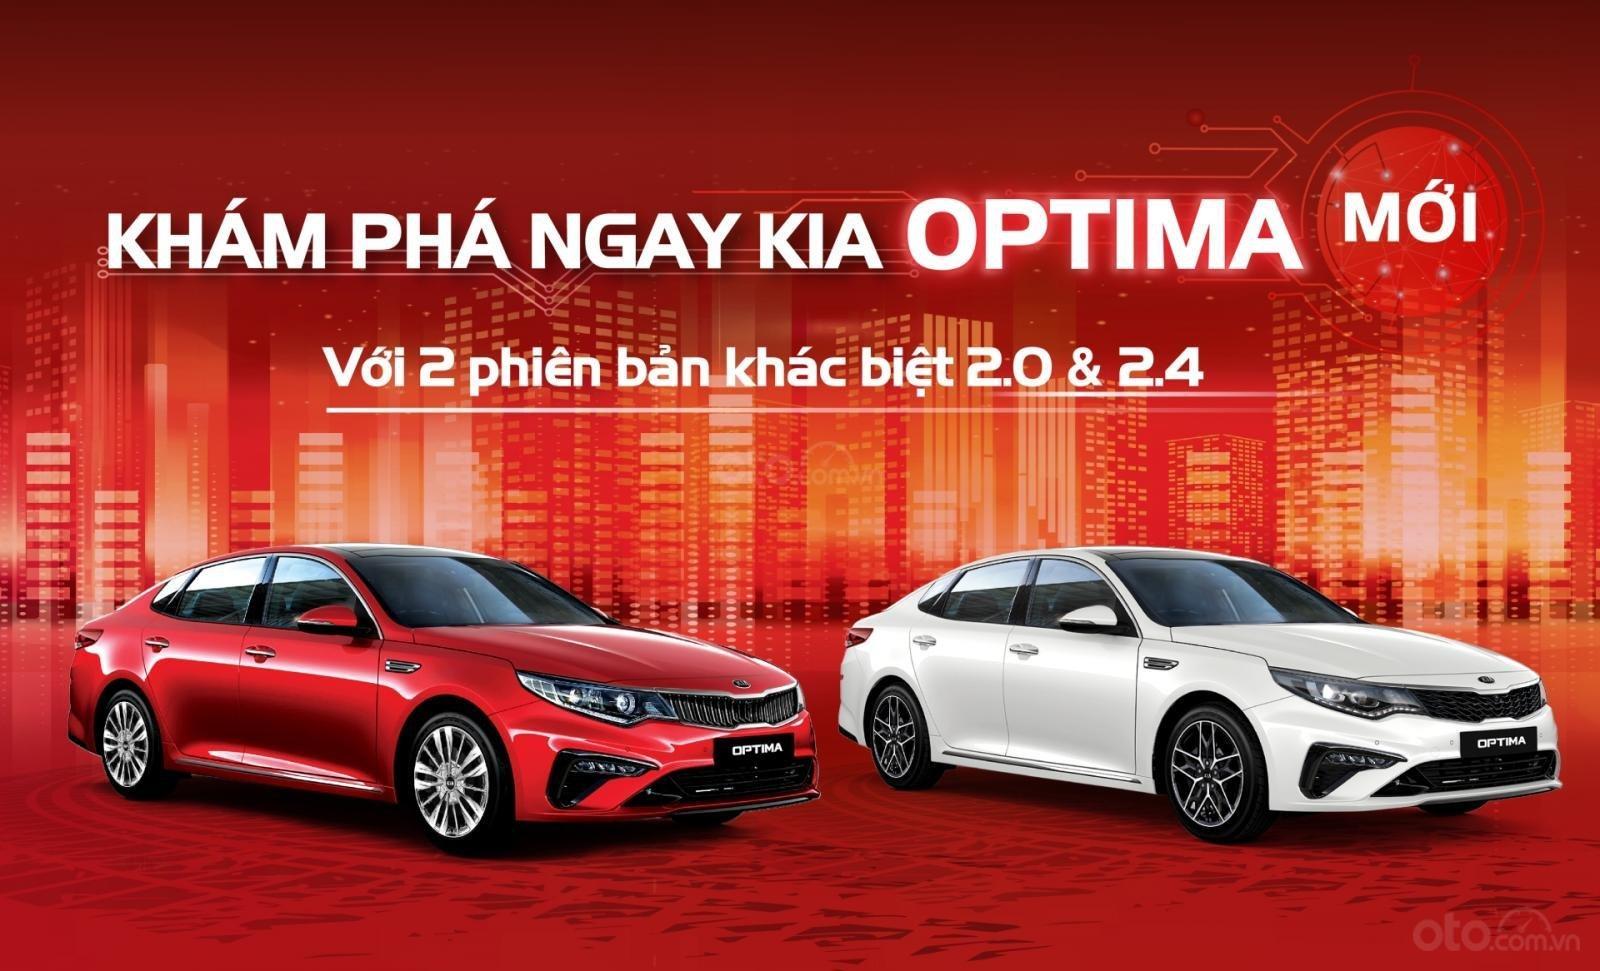 Bán Kia Optima 2.0 AT; 2.0 ATH; 2.4 GT-line giá từ 789 triệu (3)